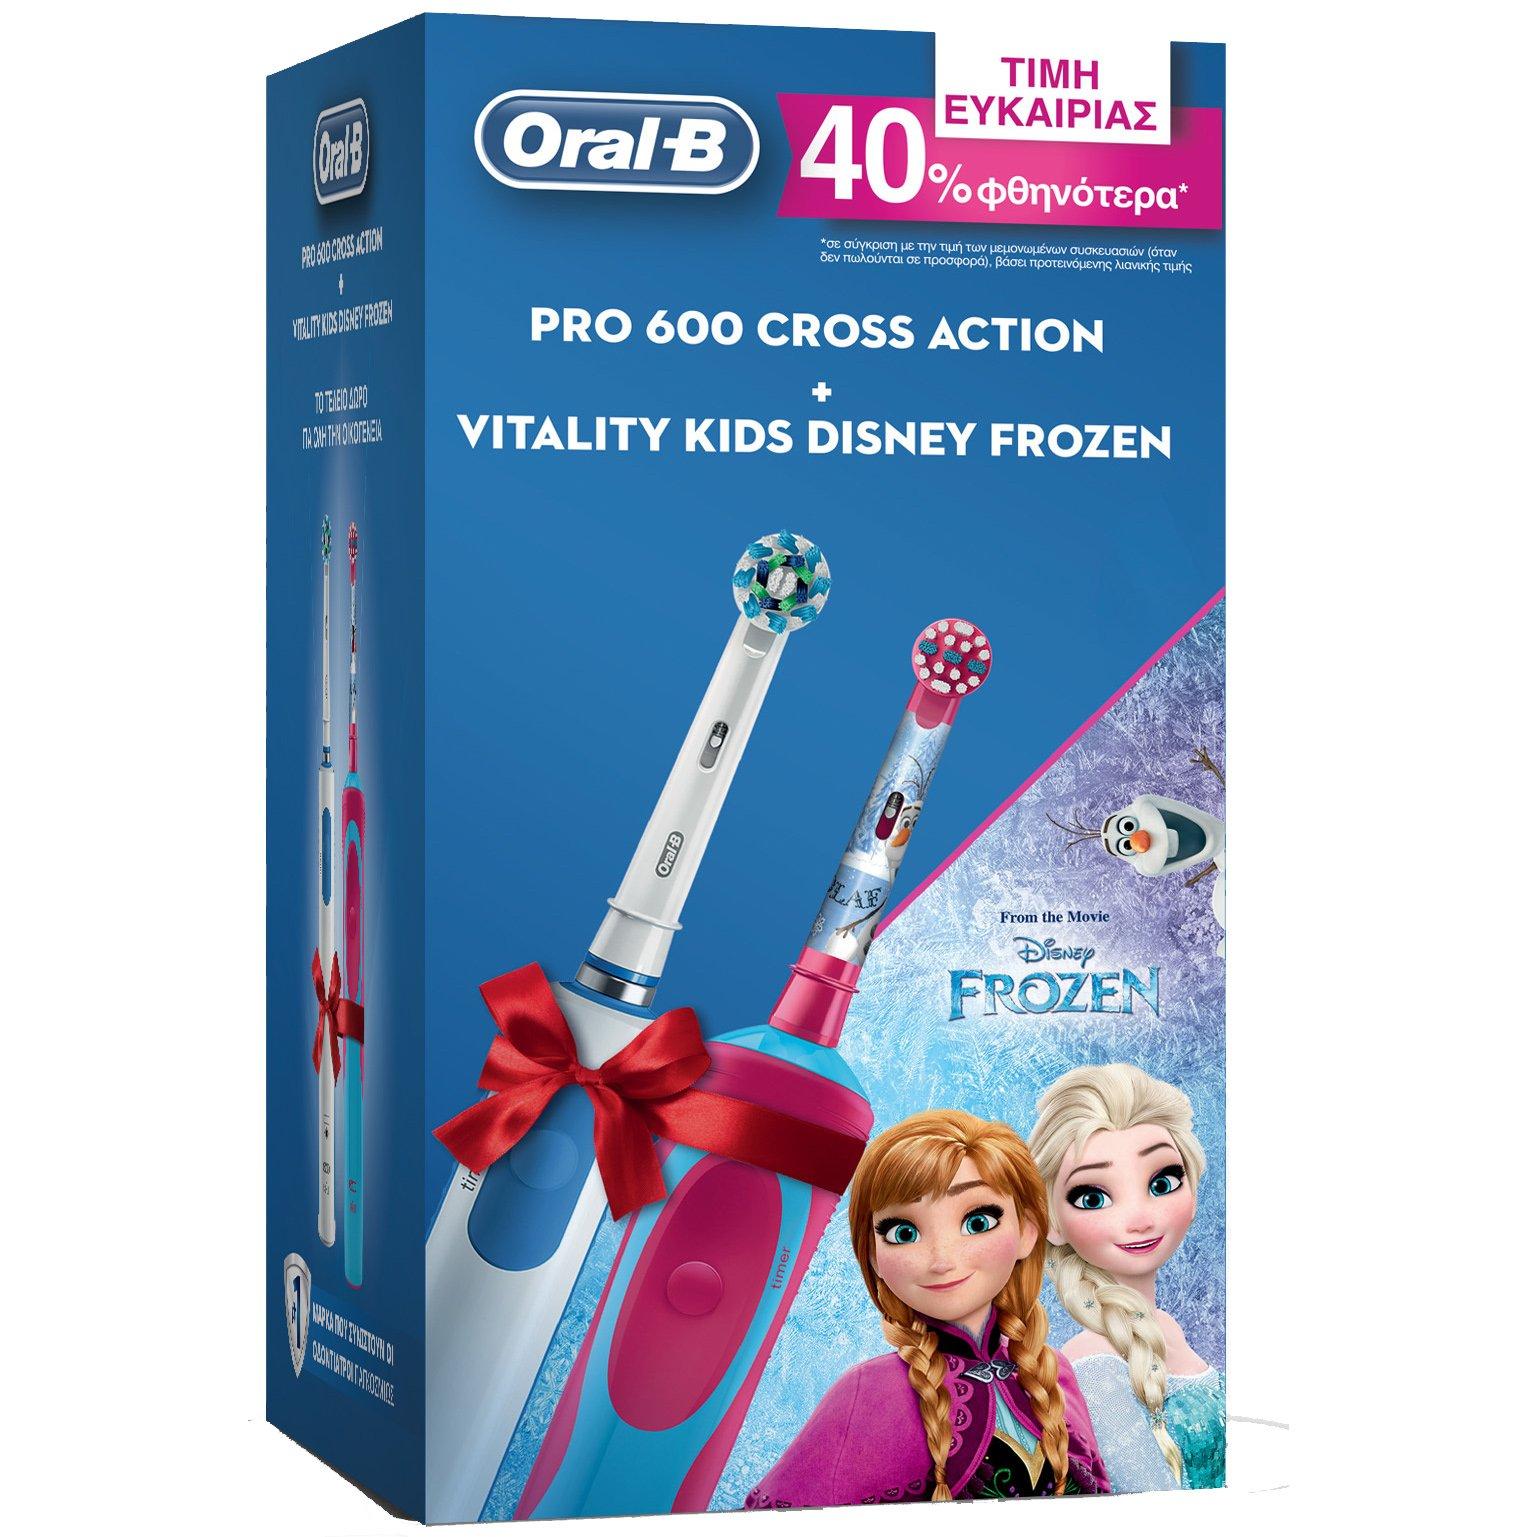 Oral-B Πακέτο Προσφοράς Pro 600 Cross Action & Vitality Kids Disney Frozen 3+ Ετών, 40% Φθηνότερα